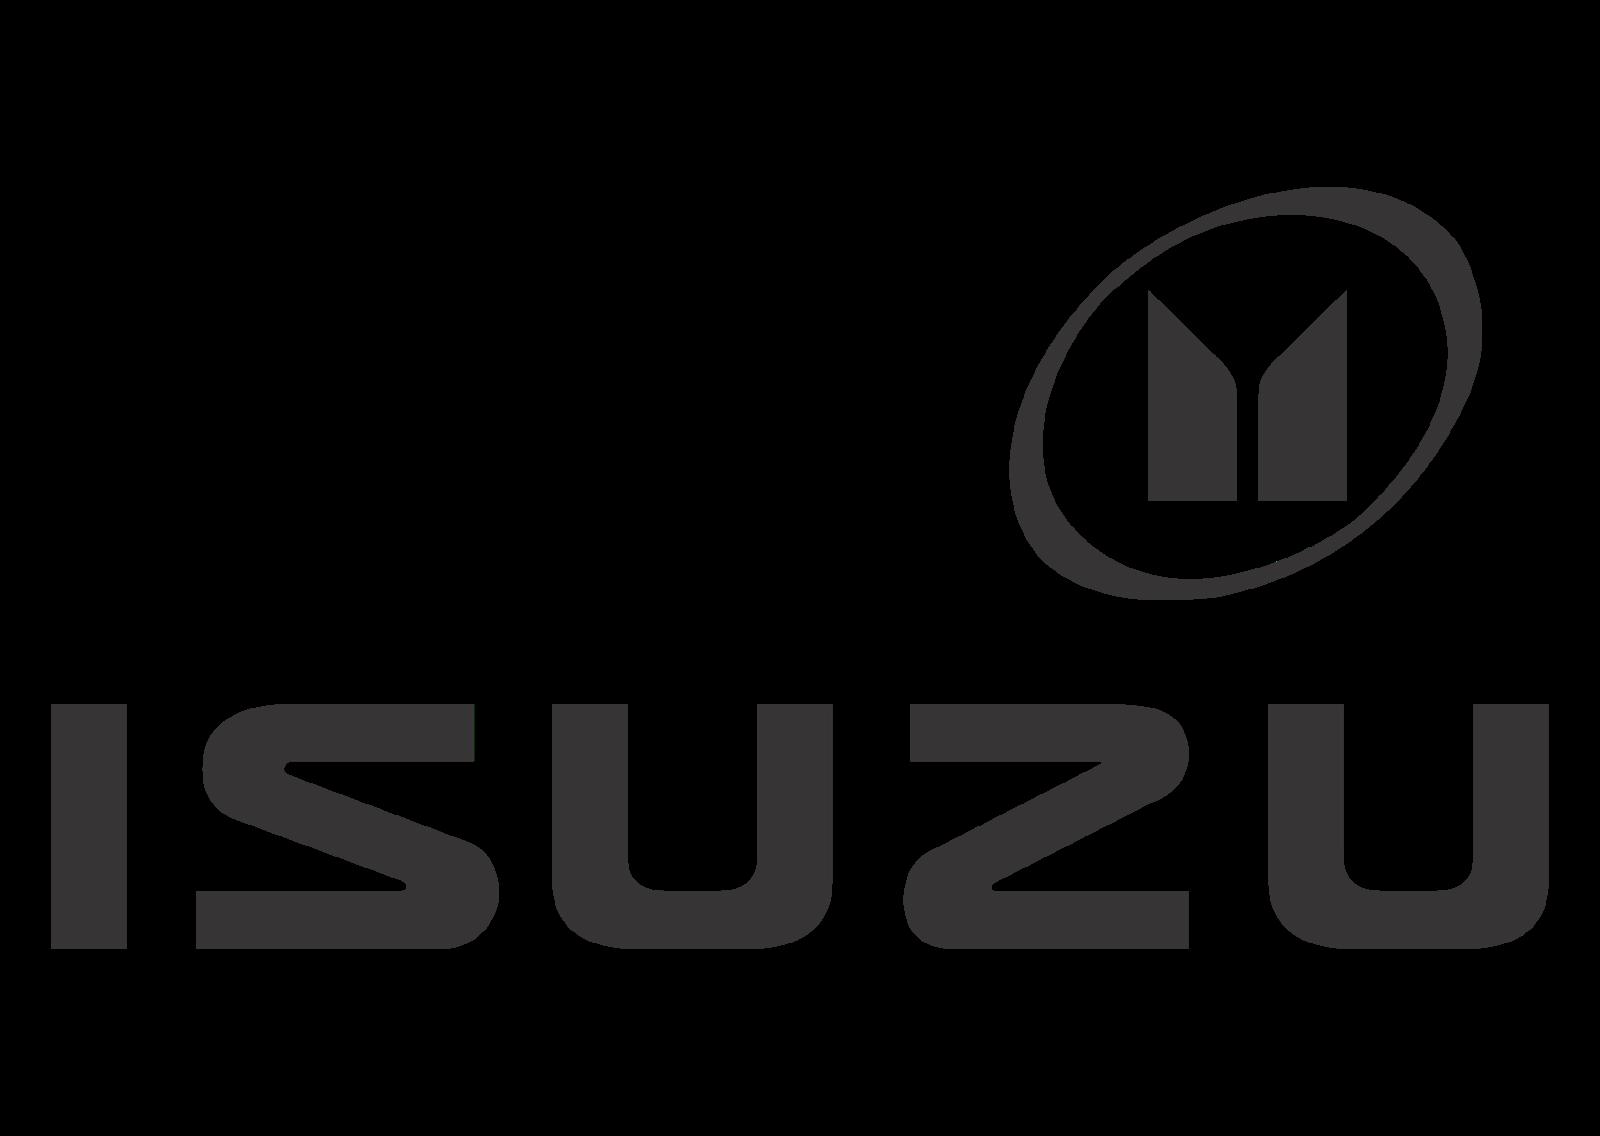 Isuzu Logo Vector